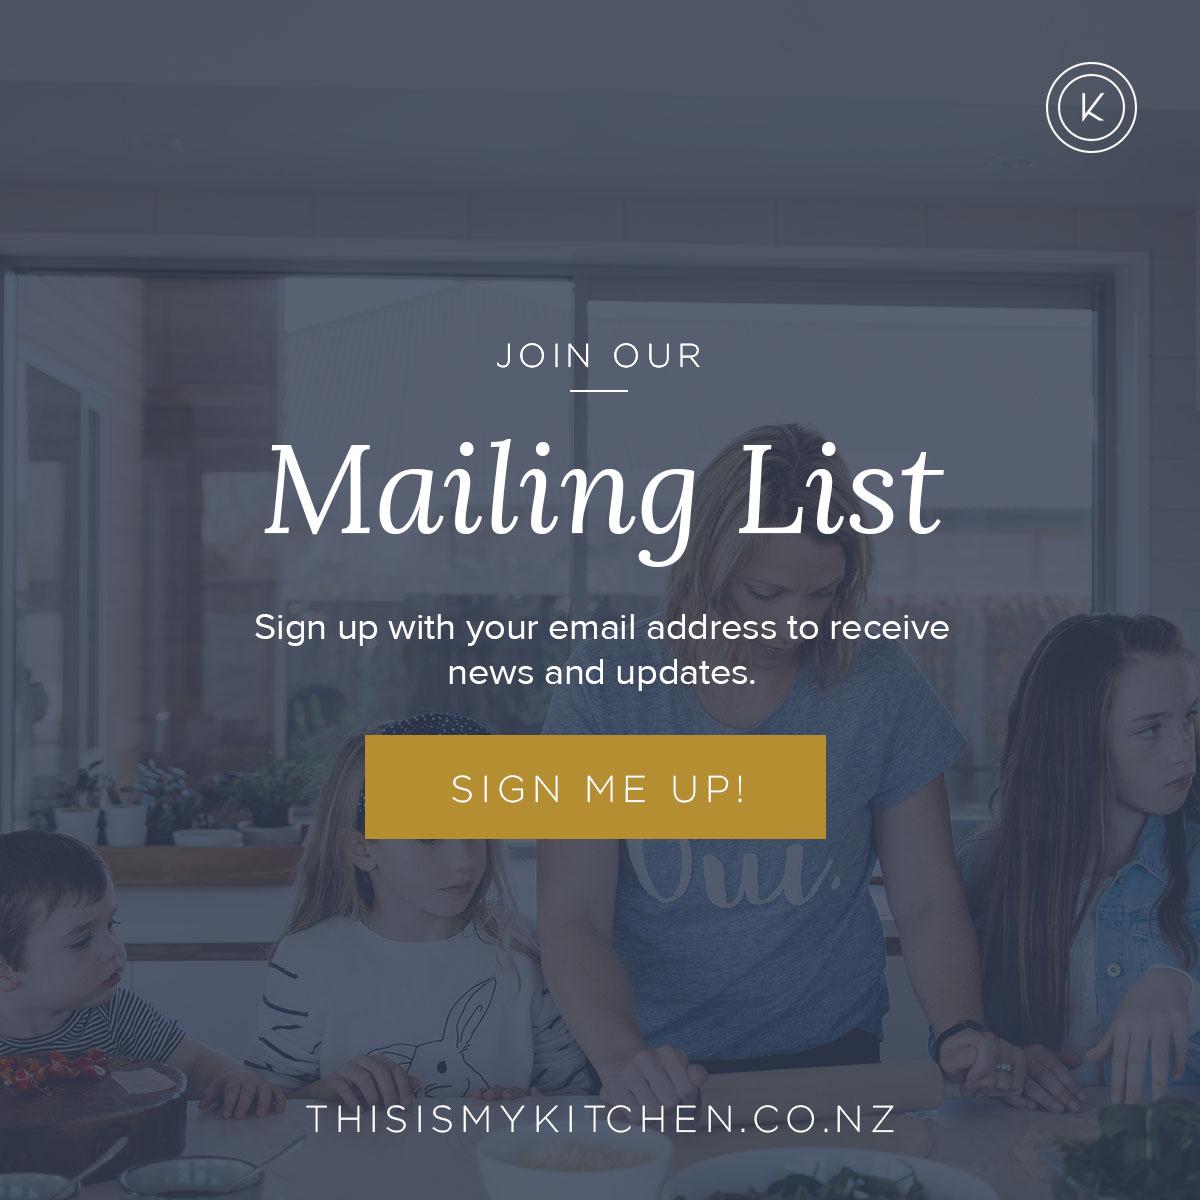 _Mailing List.jpg